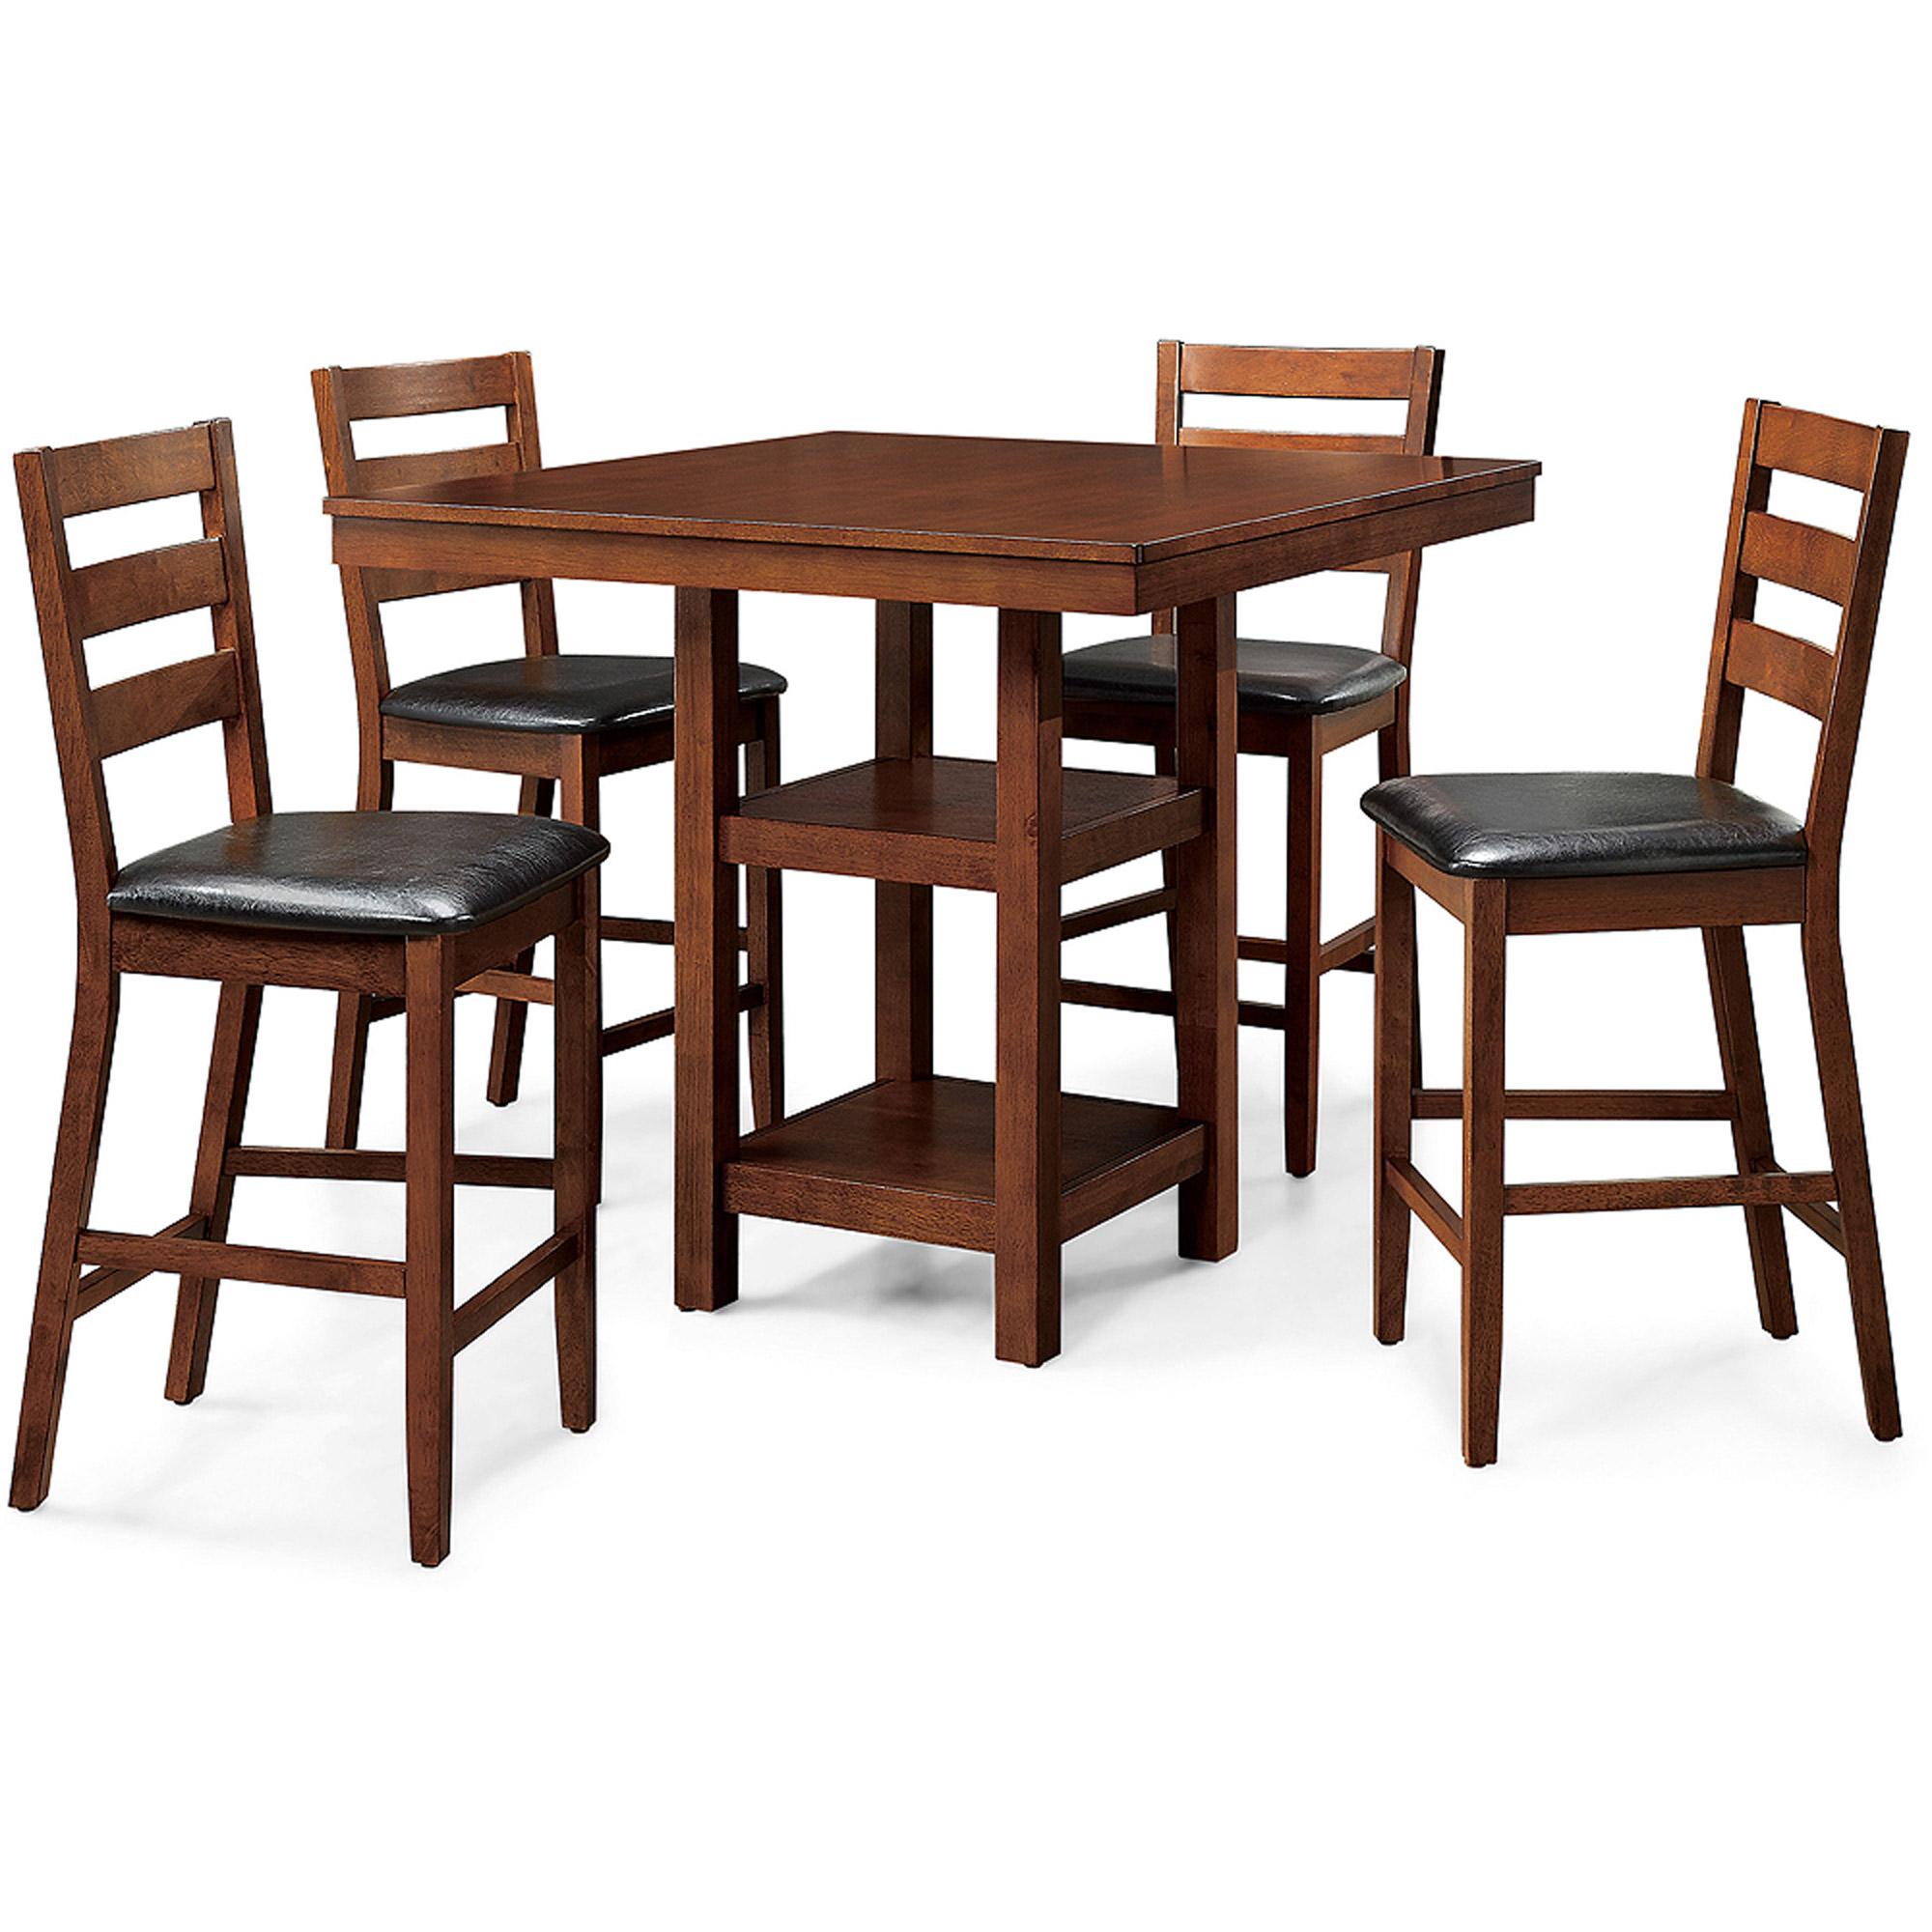 Better Homes & Gardens Dalton Park 5-Piece Counter Height Dining Set ...